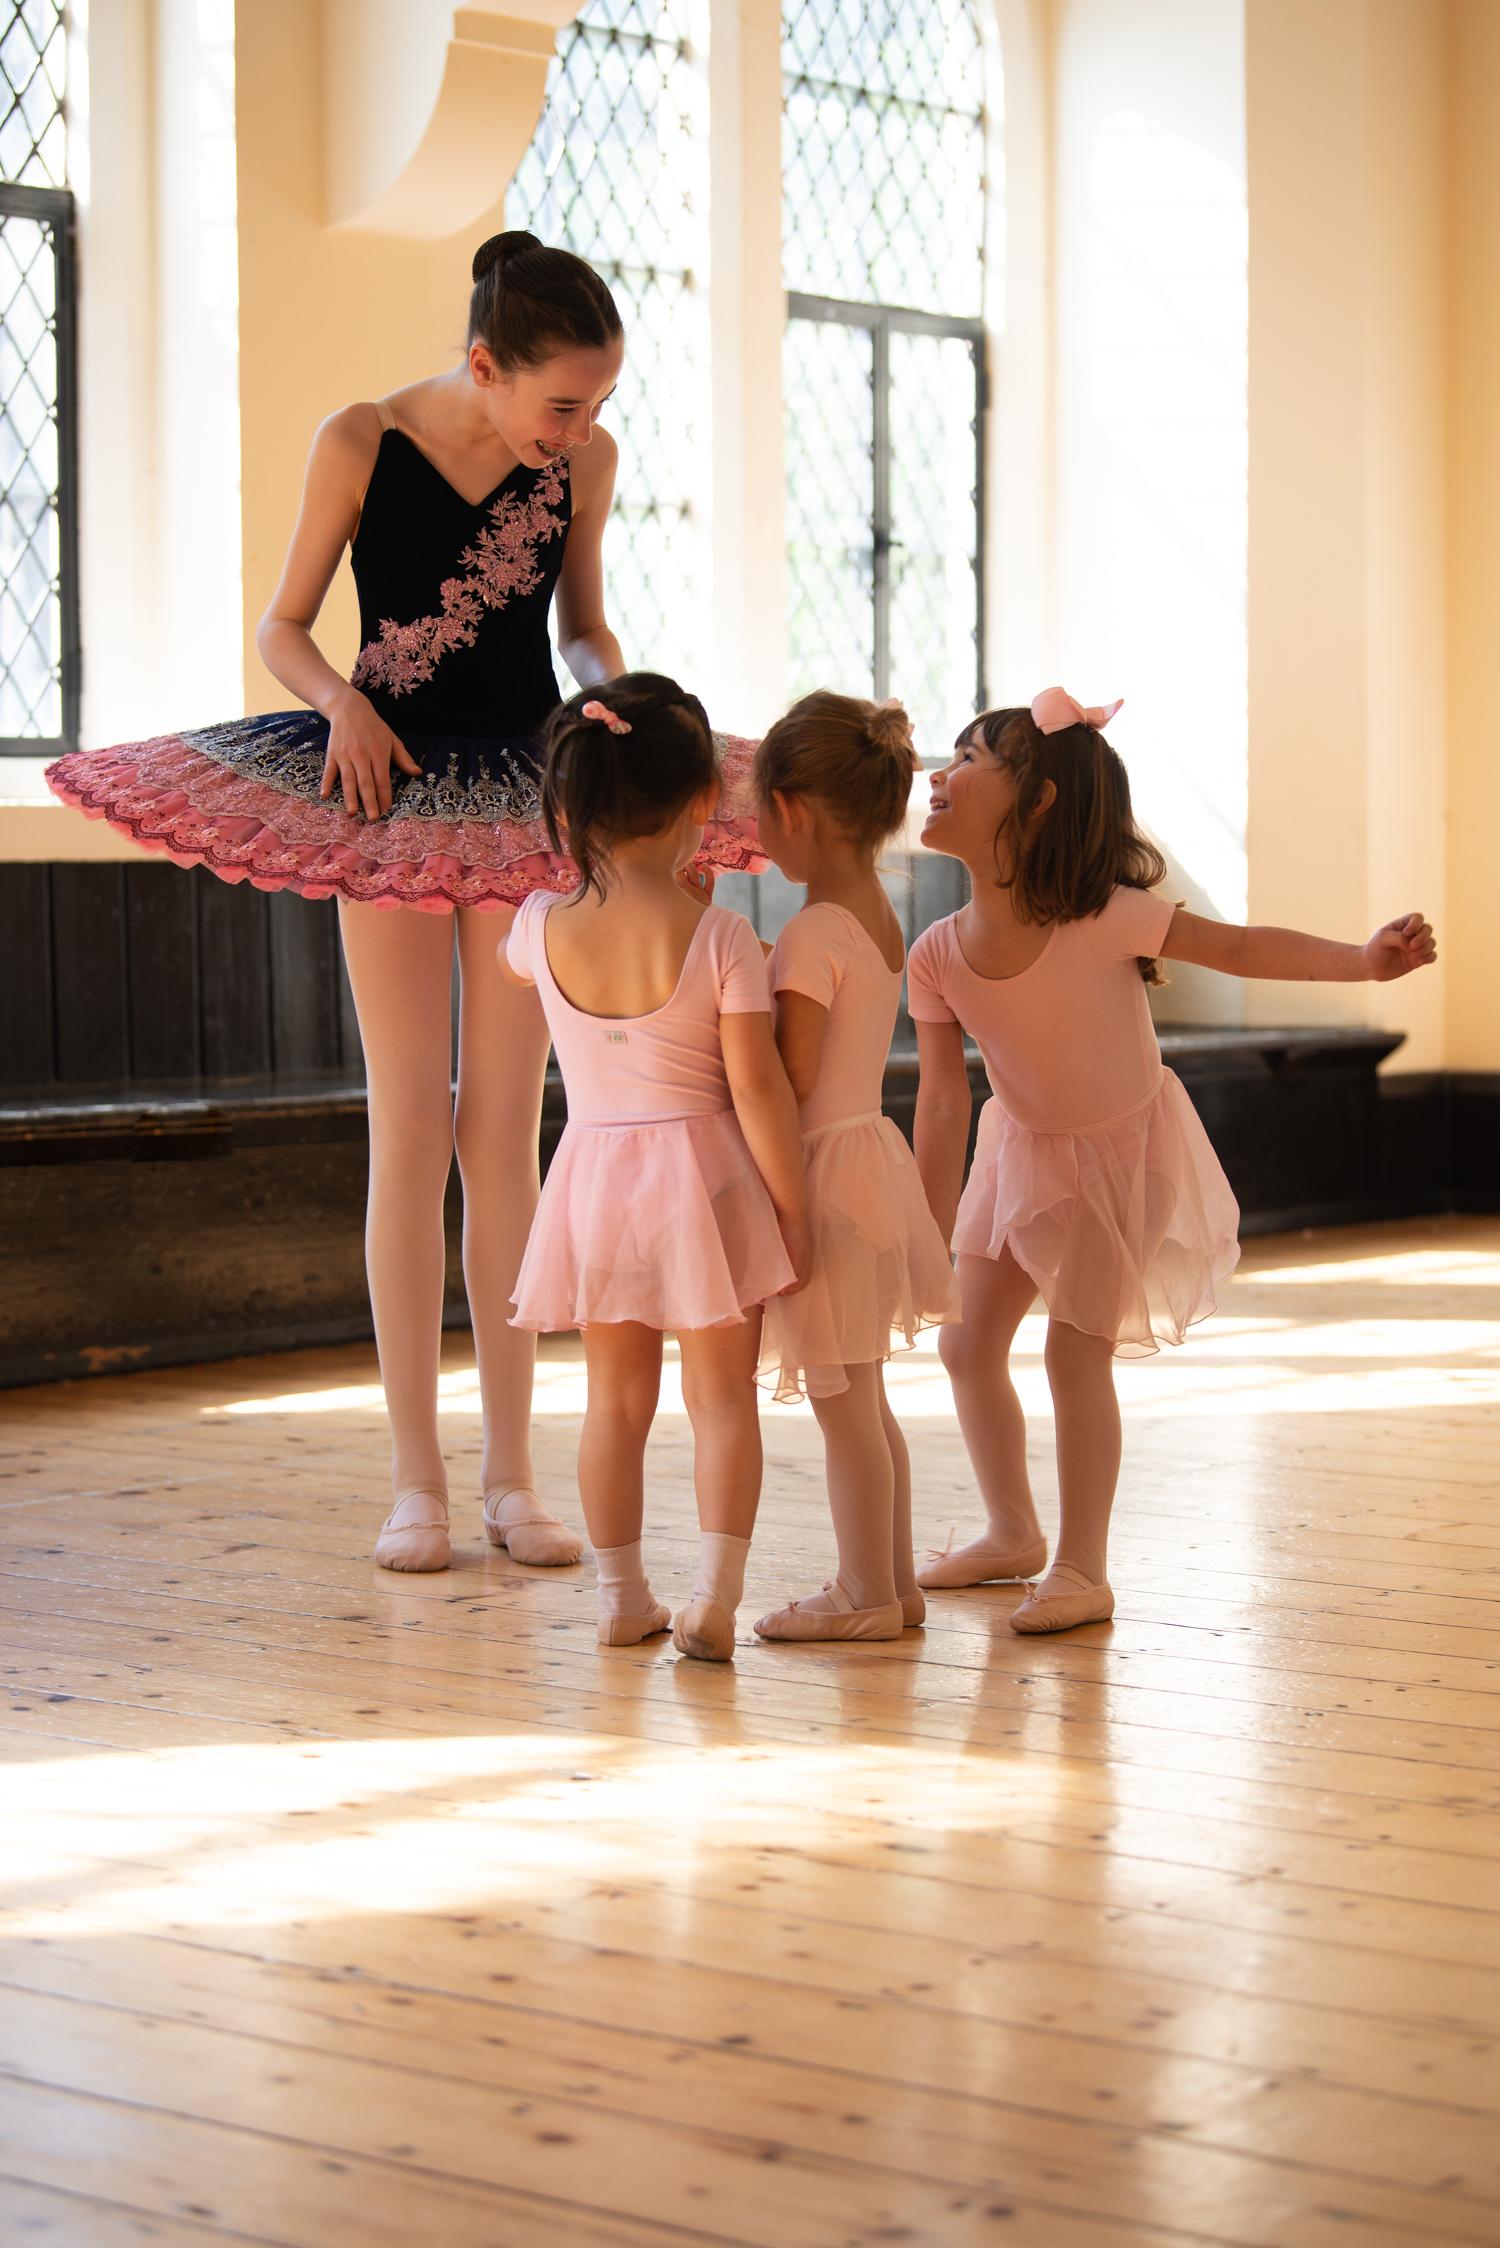 Dancer: Liberty  Tutu by Baby Bunheads  Photographer: Karolina Webb